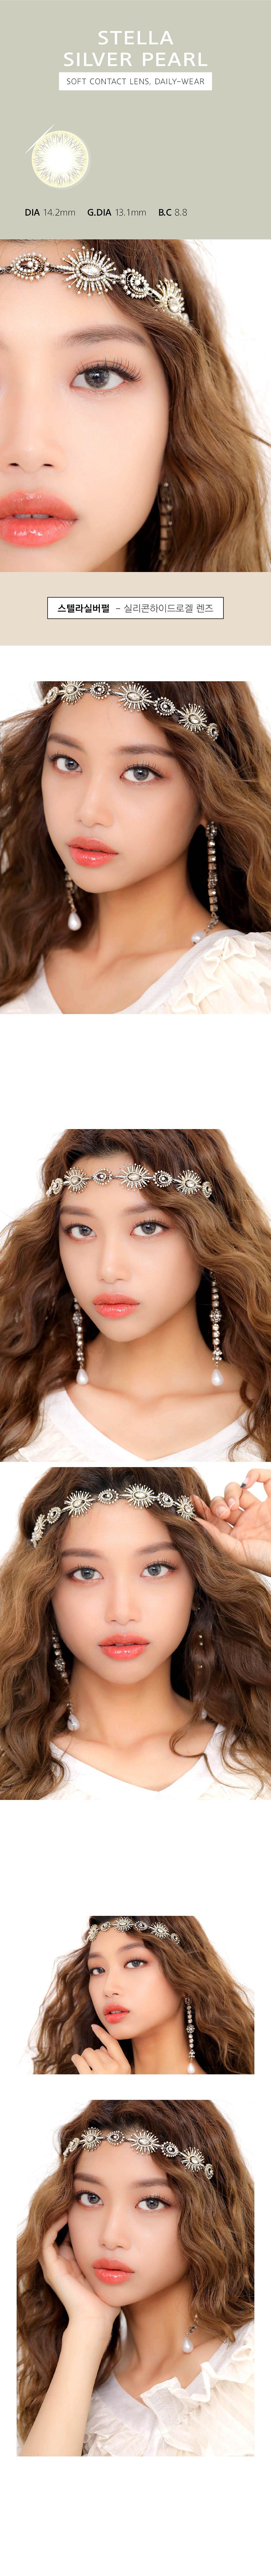 stella-silver-pearl-.jpg